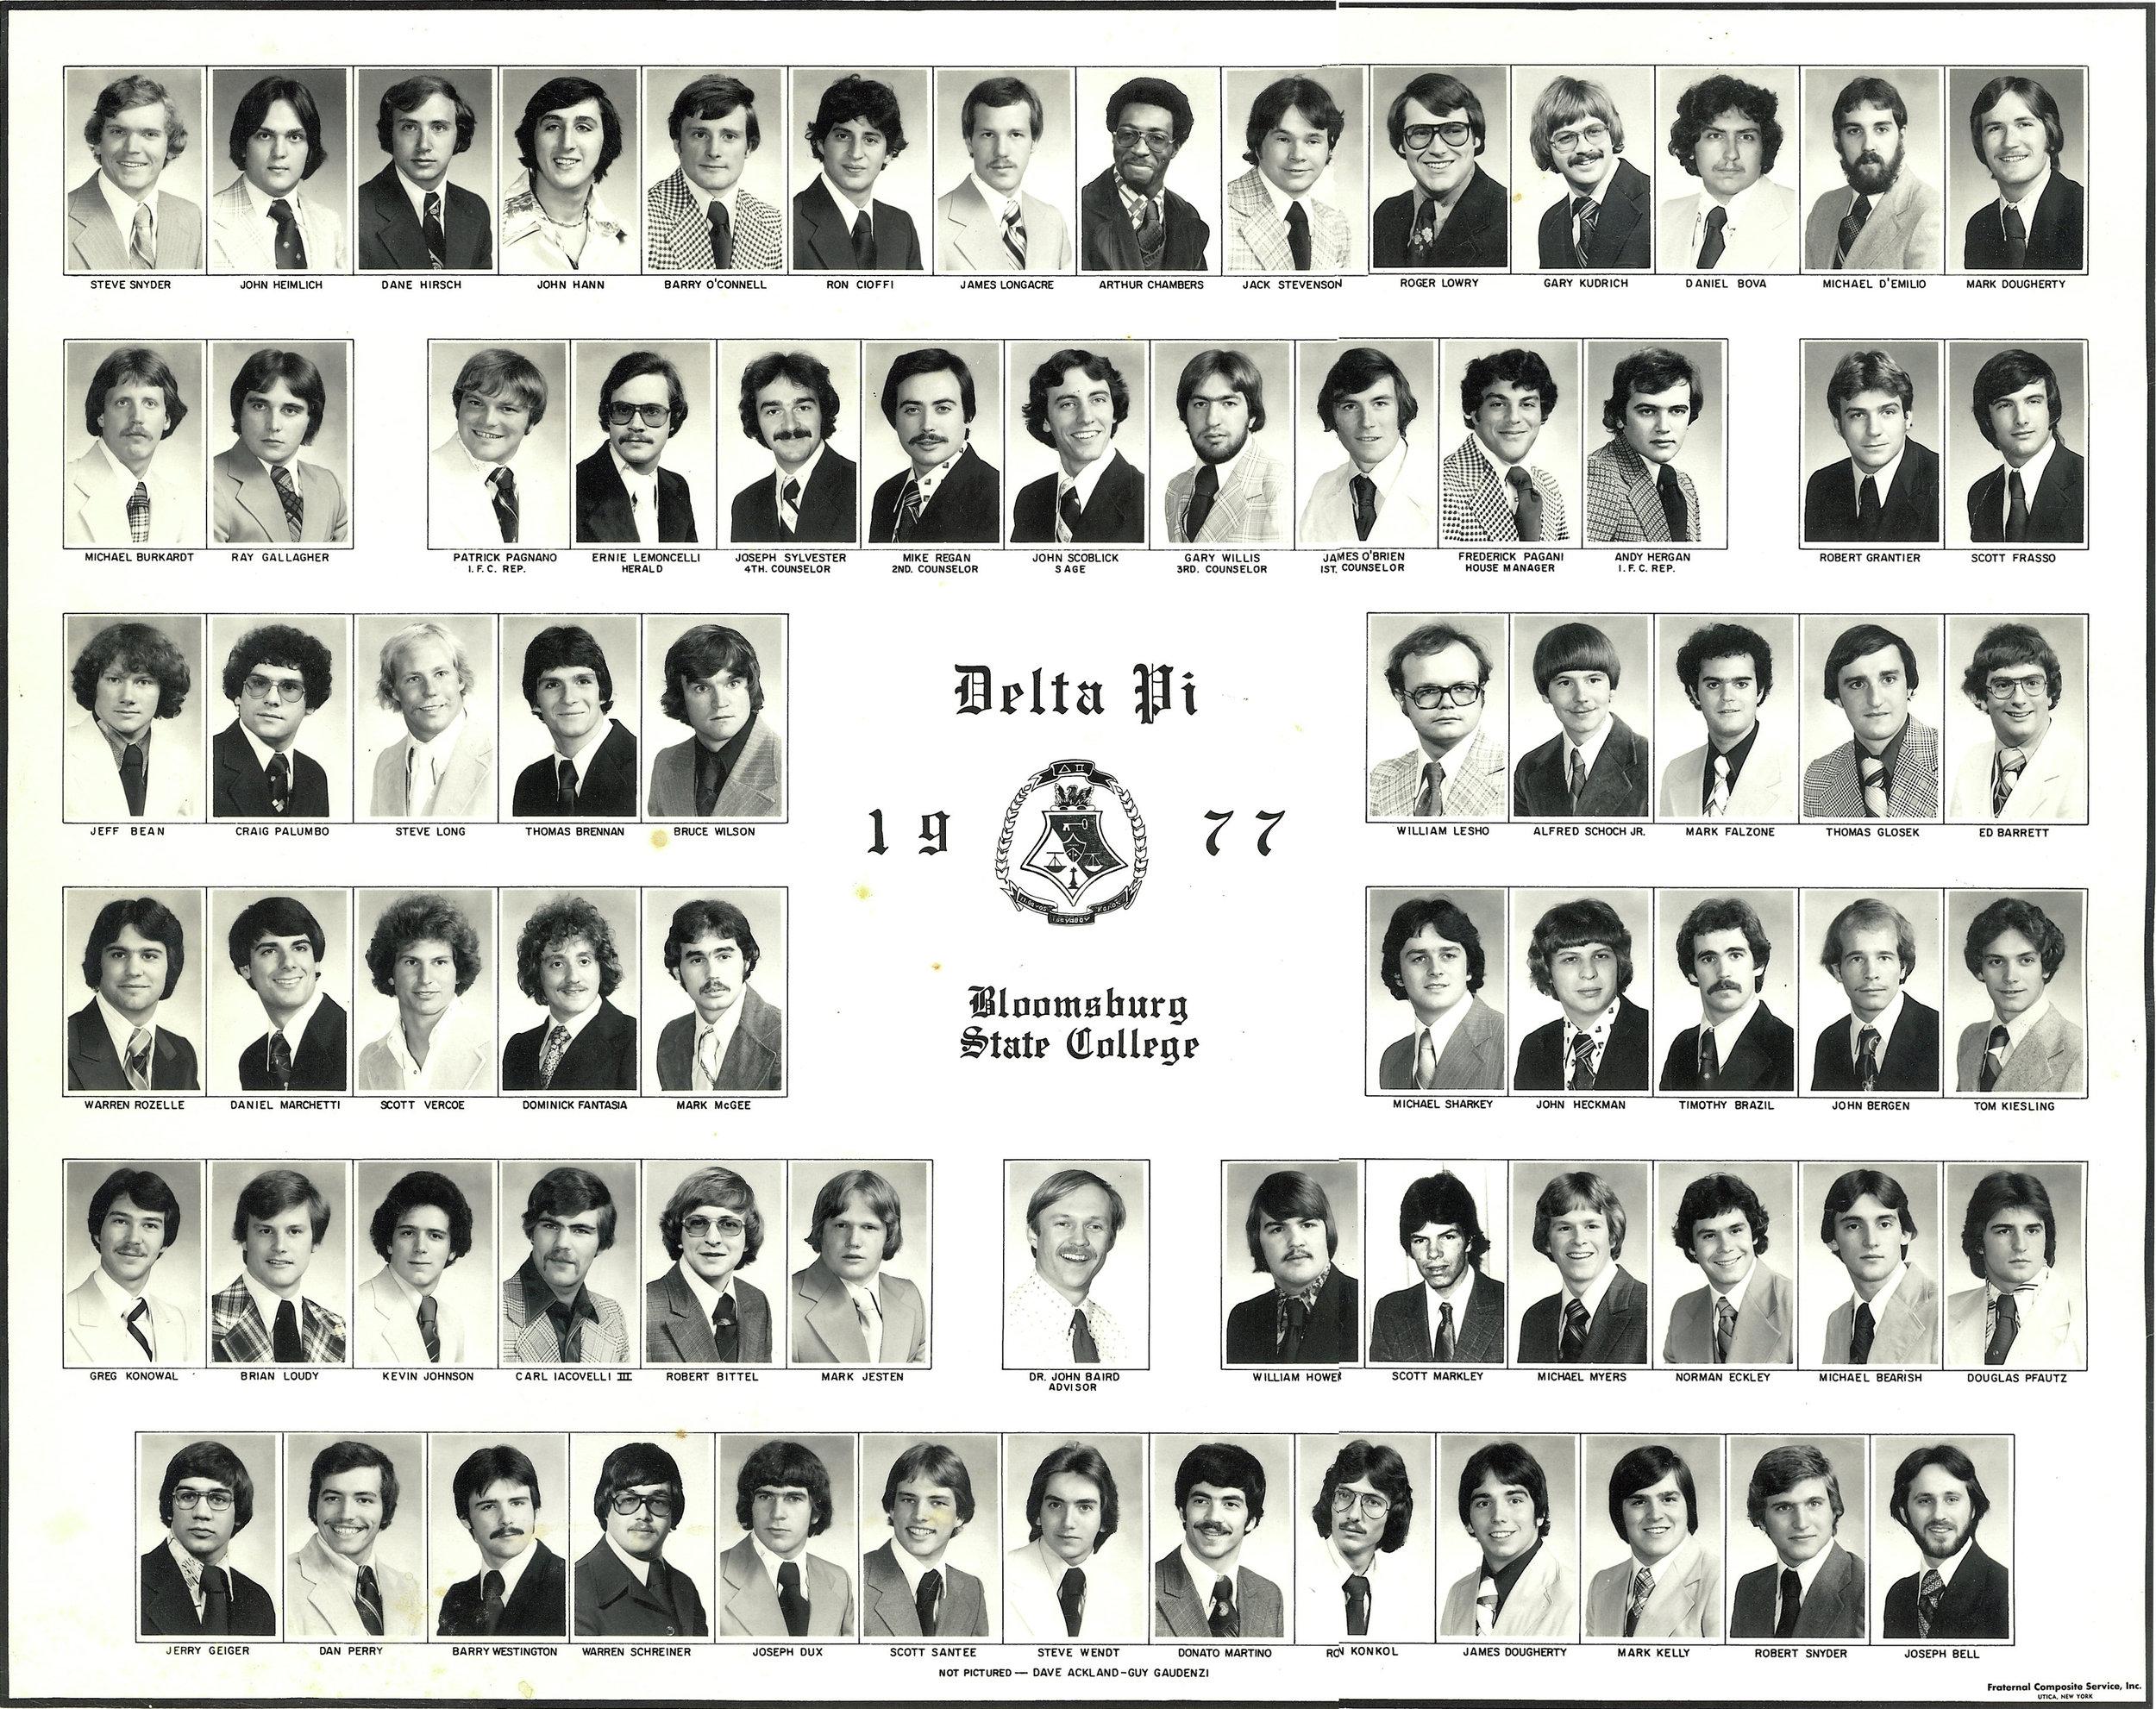 DeltaPi-1977-FinalEdit.jpg